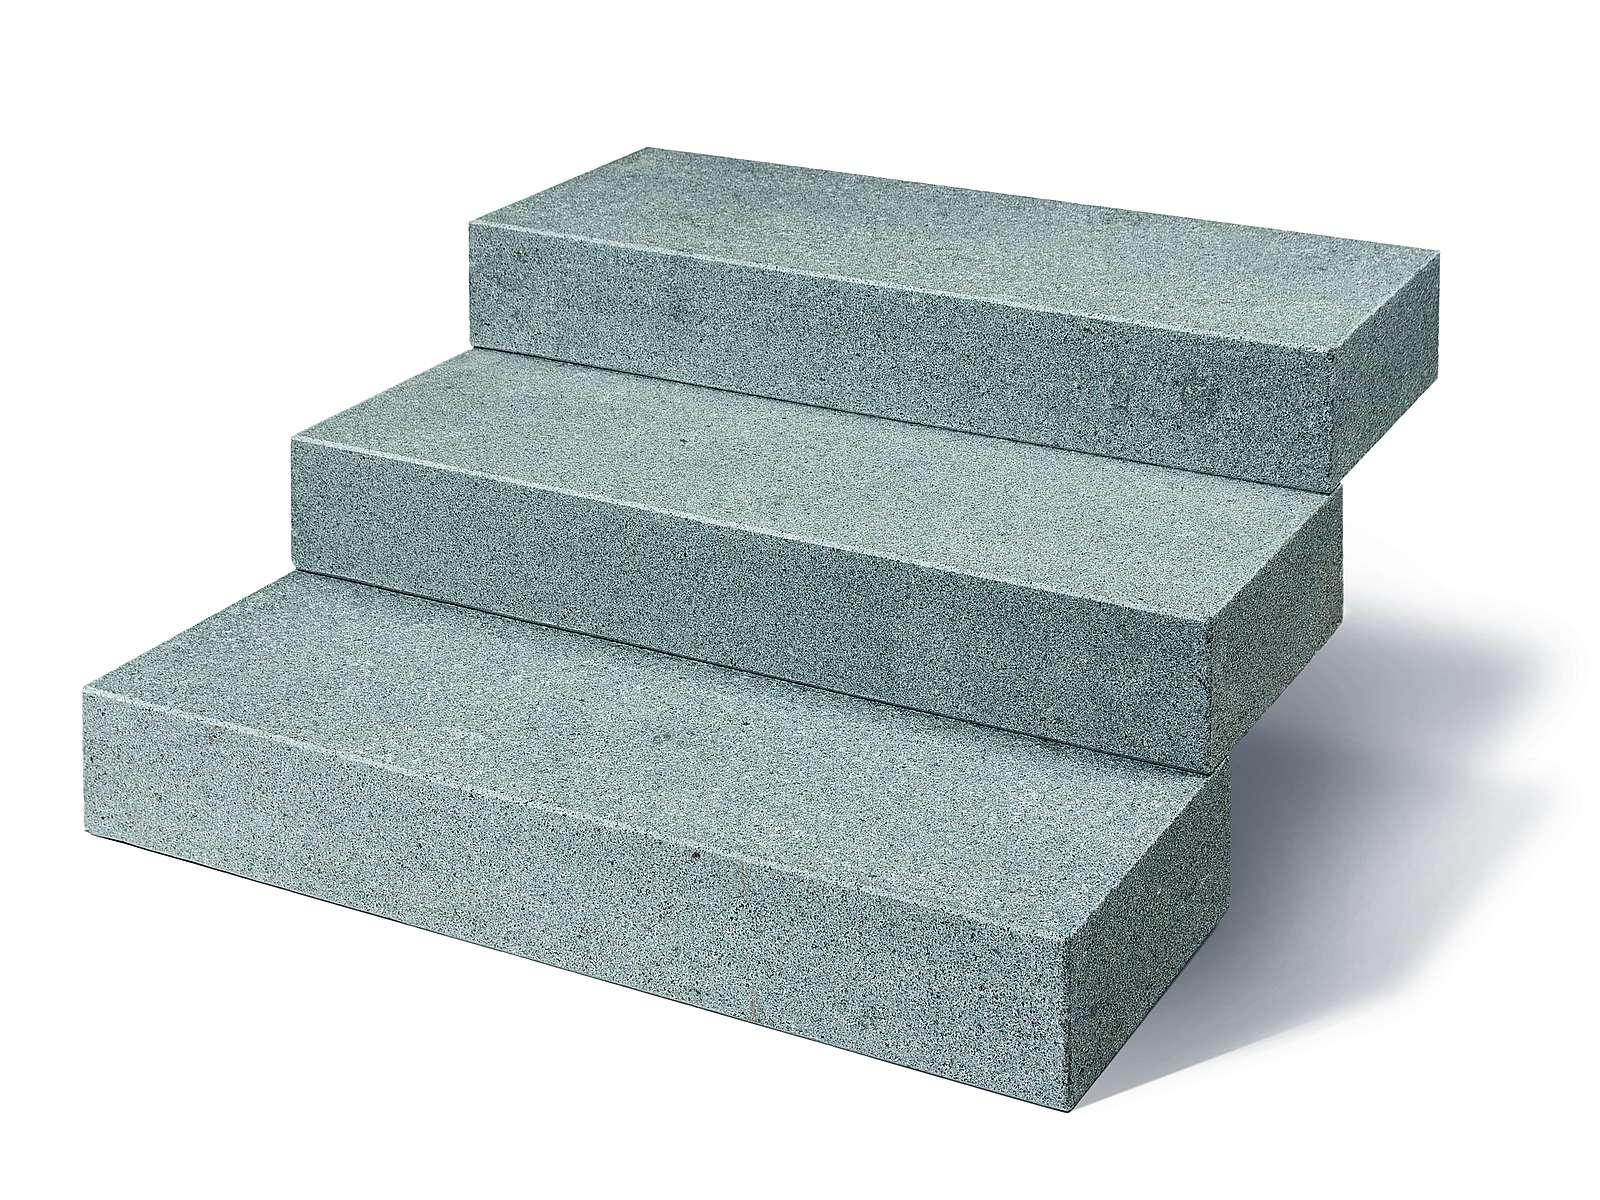 Granit Blockstufen Kristall anthrazit